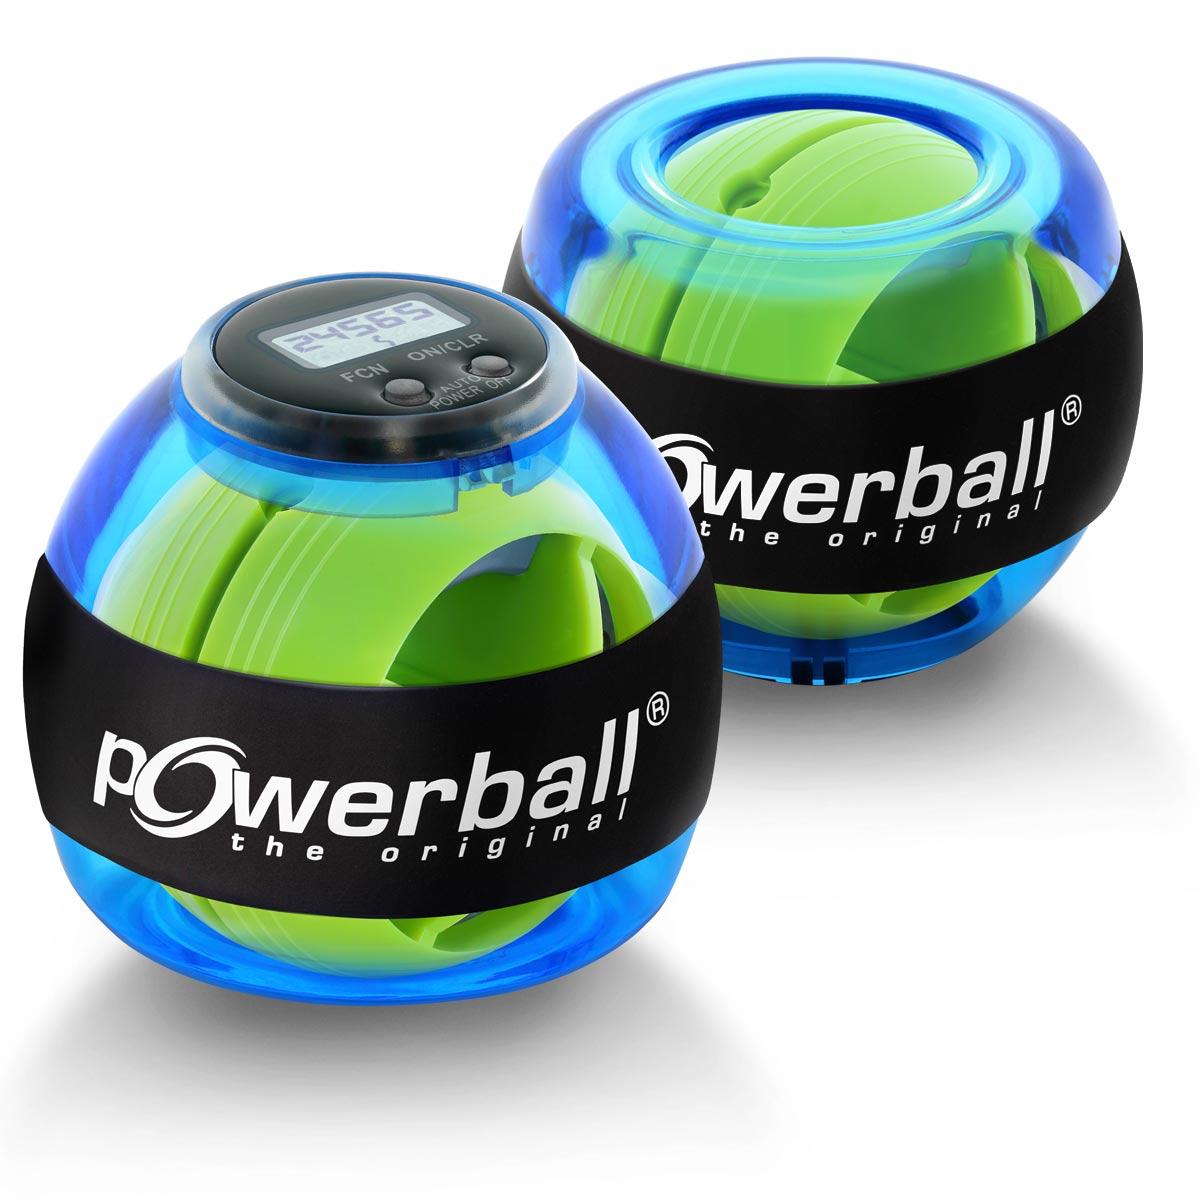 original-powerball-counter-oben-unten